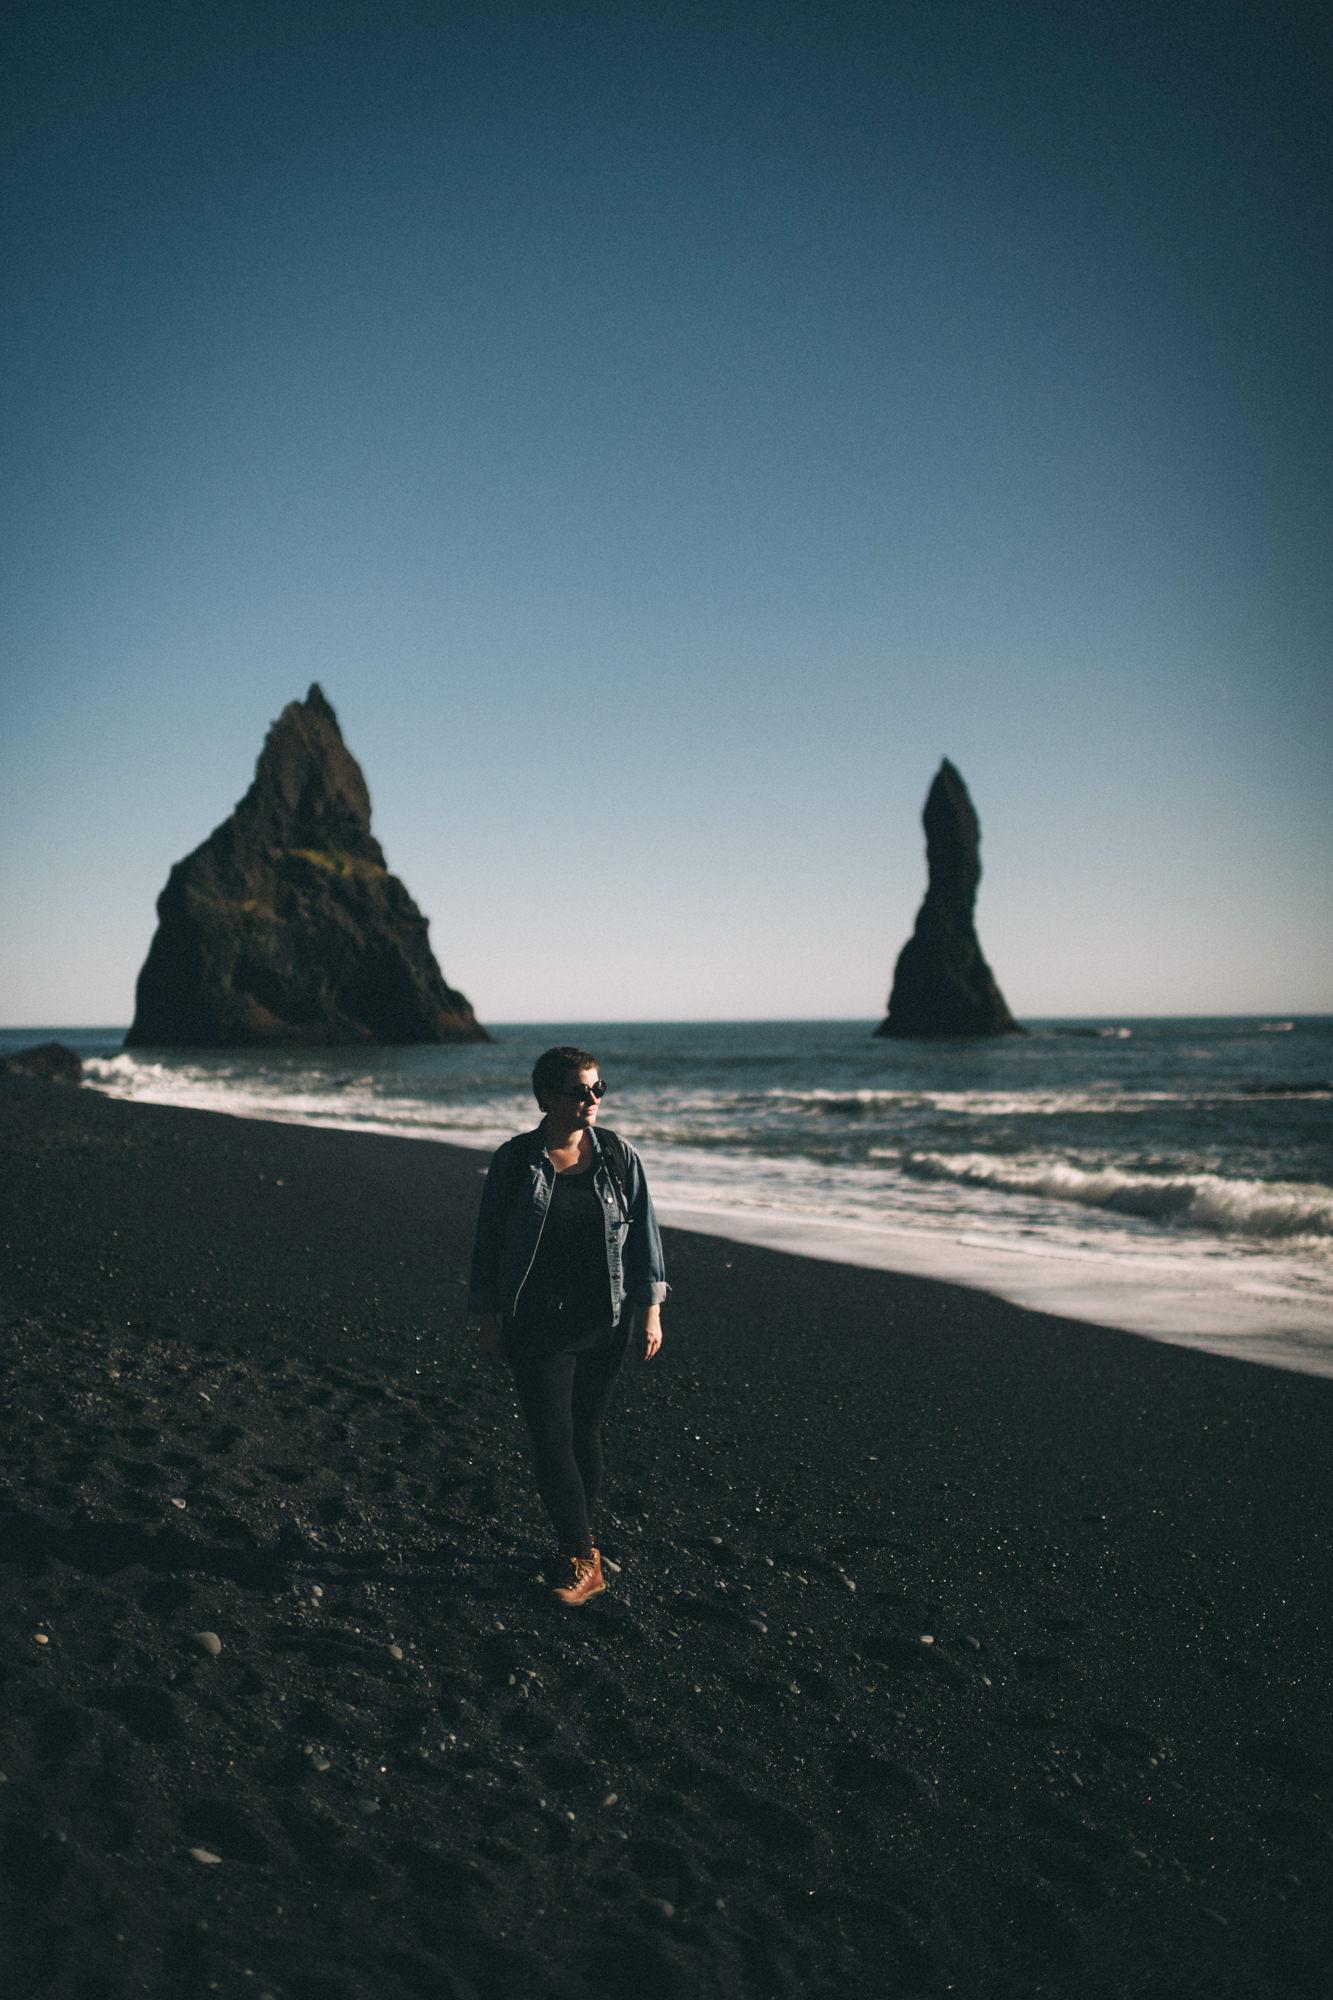 Sarah-Katherine-Davis-Photography-Iceland-Adventure-Elopement-Photographer-Louisville-Kentucky-Wedding-Photographer-Travel-Vik-Beach-Engagement-Session-Cozy-Iceland-South-Coast-393edit.jpg